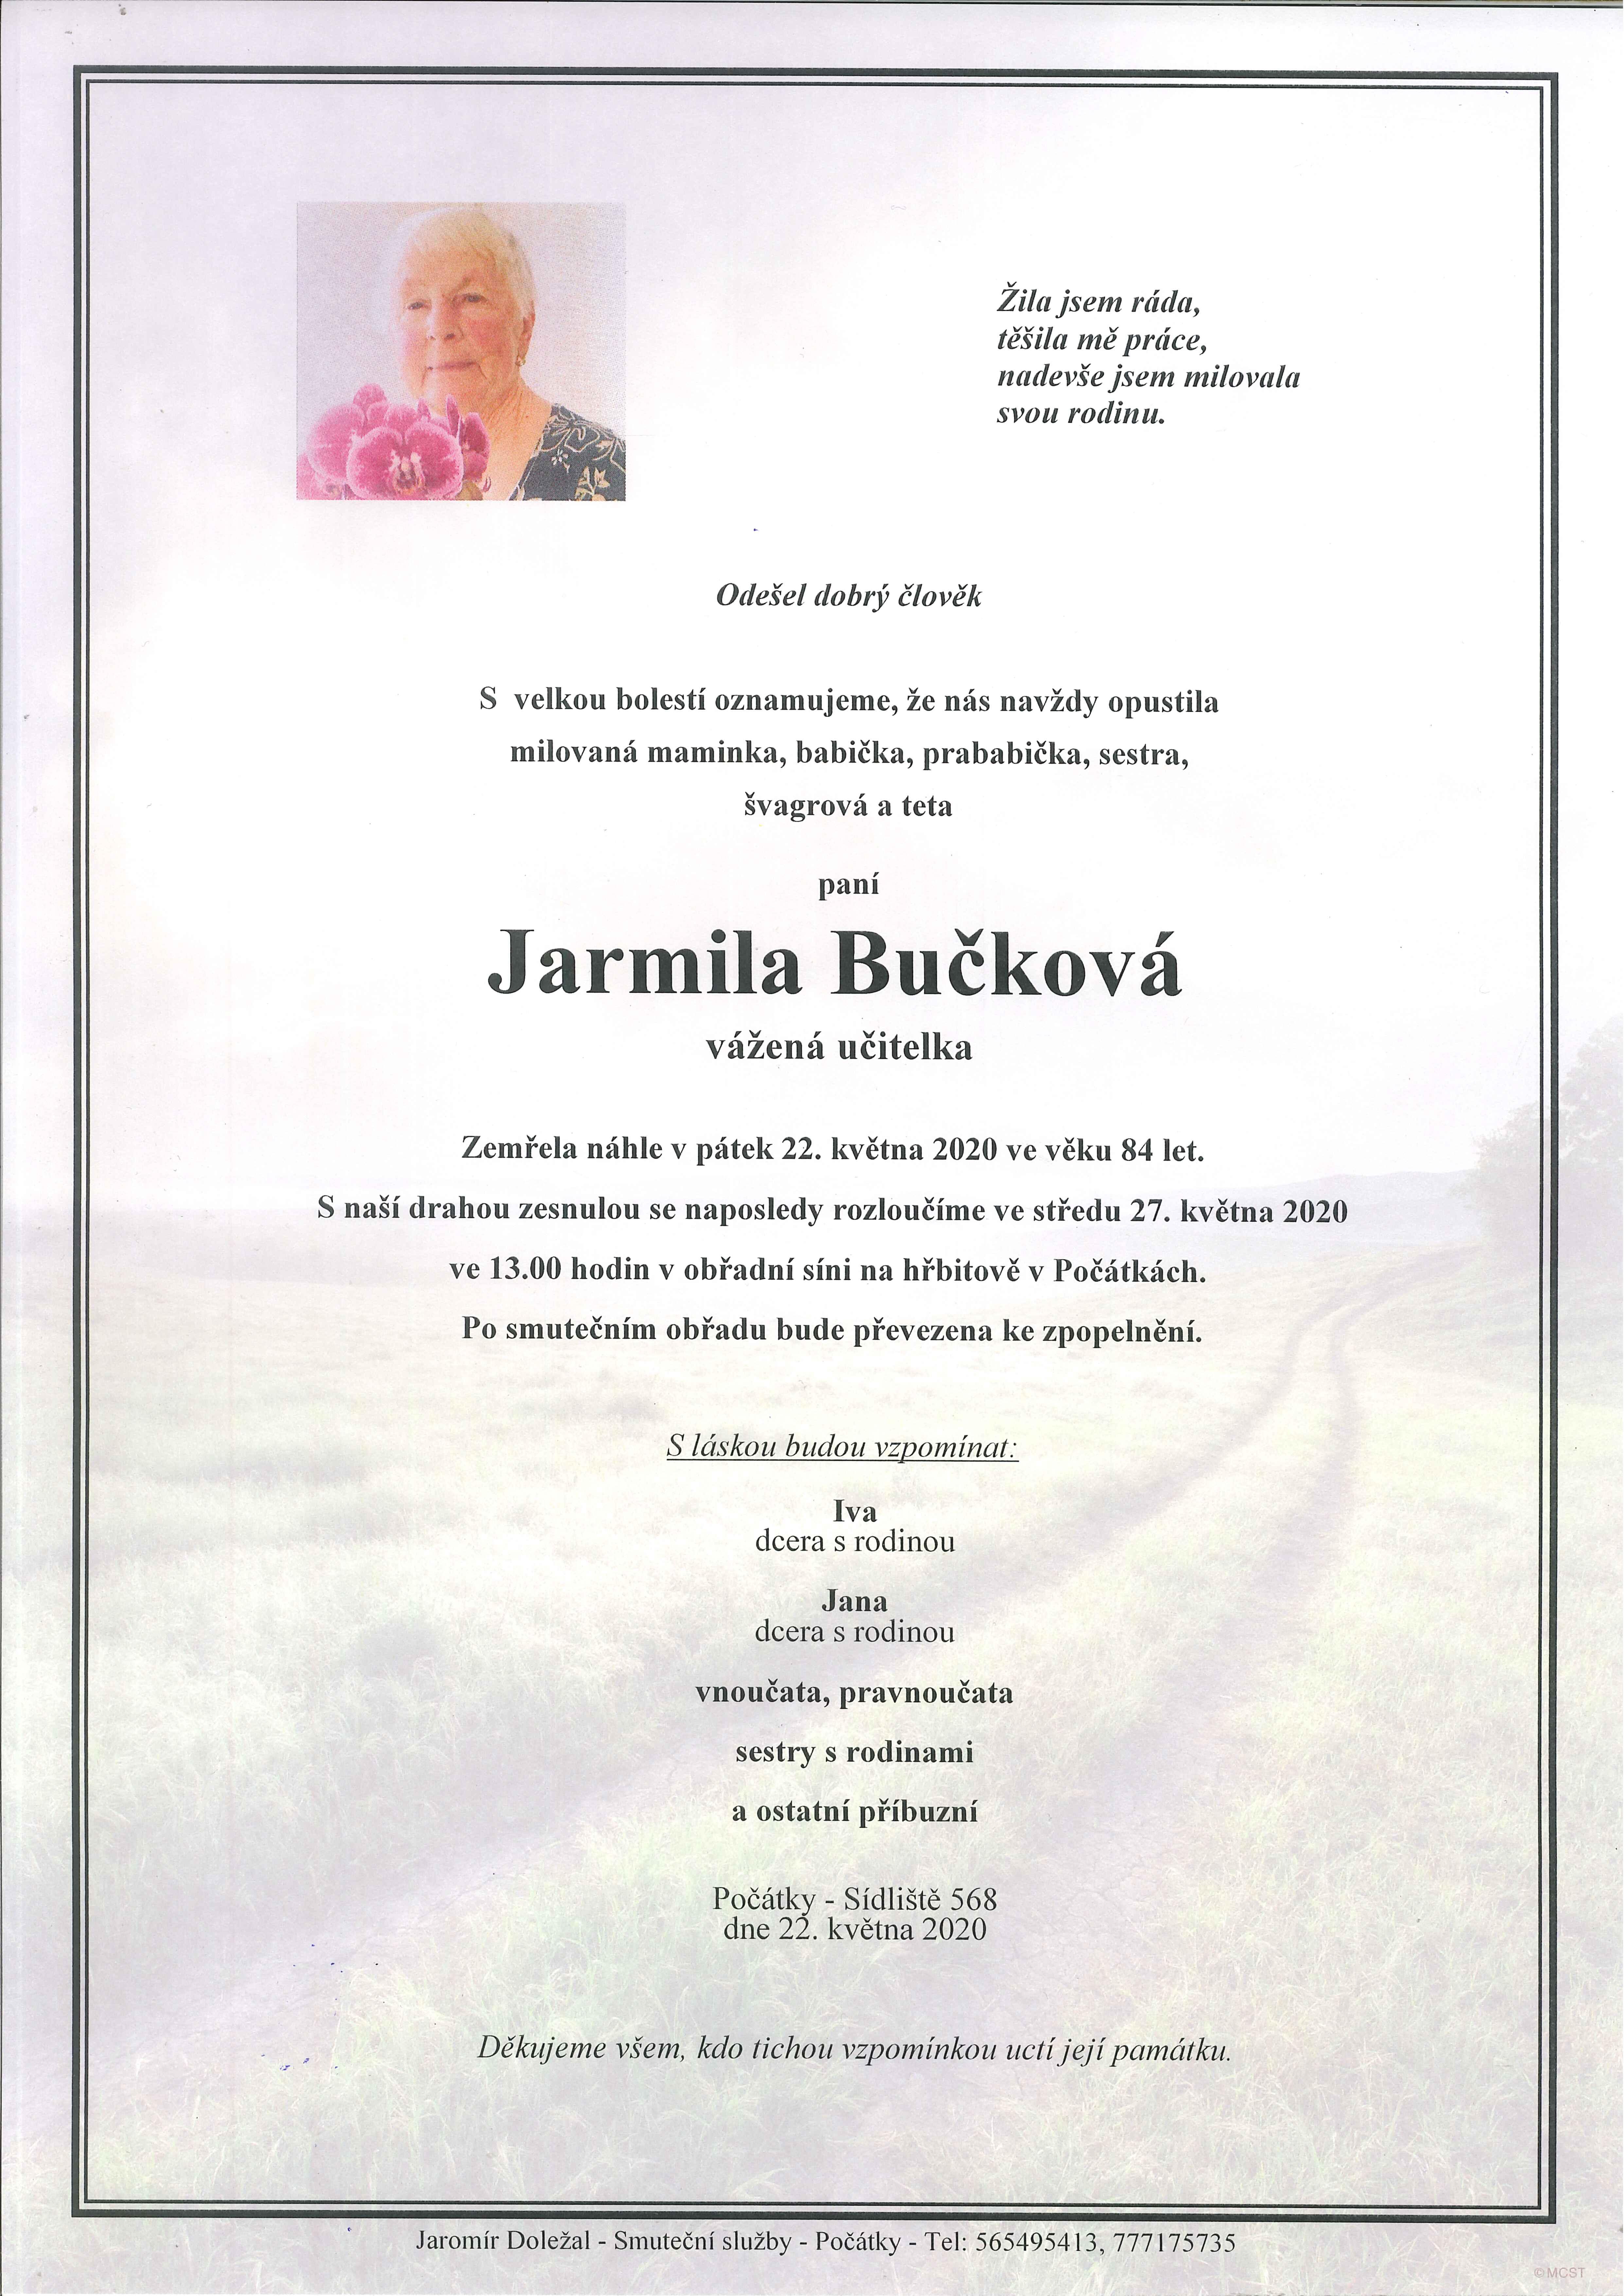 Jarmila Bučková